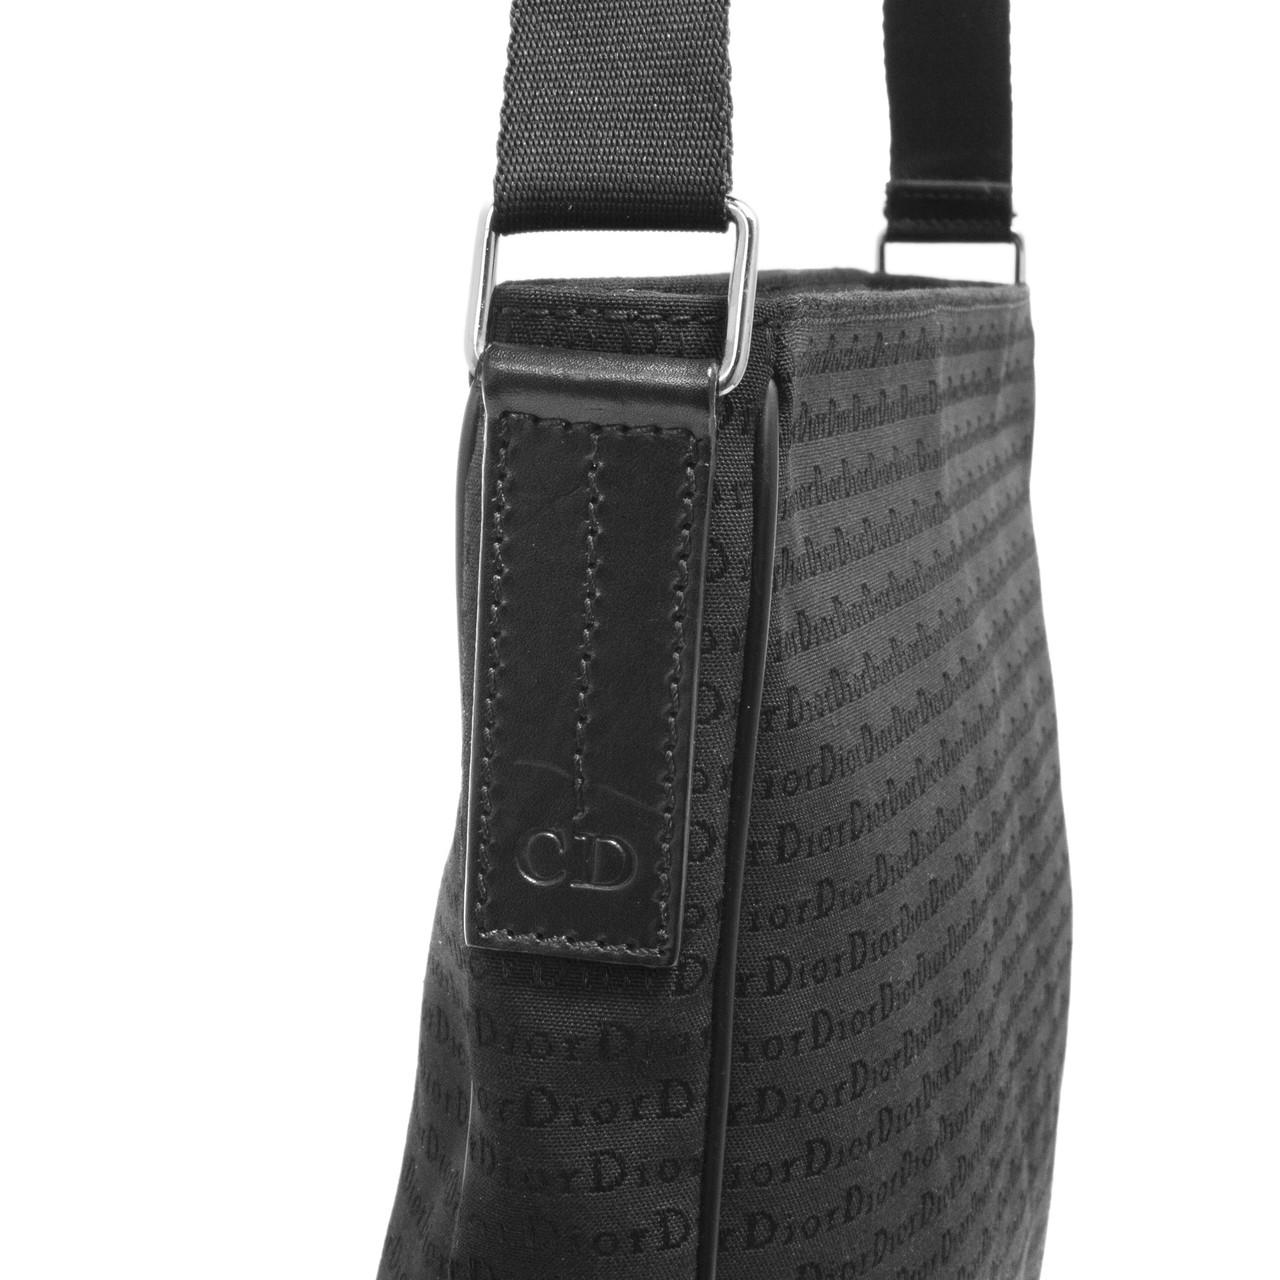 1cb91fec41a Dior Black Canvas Messenger Bag - modaselle